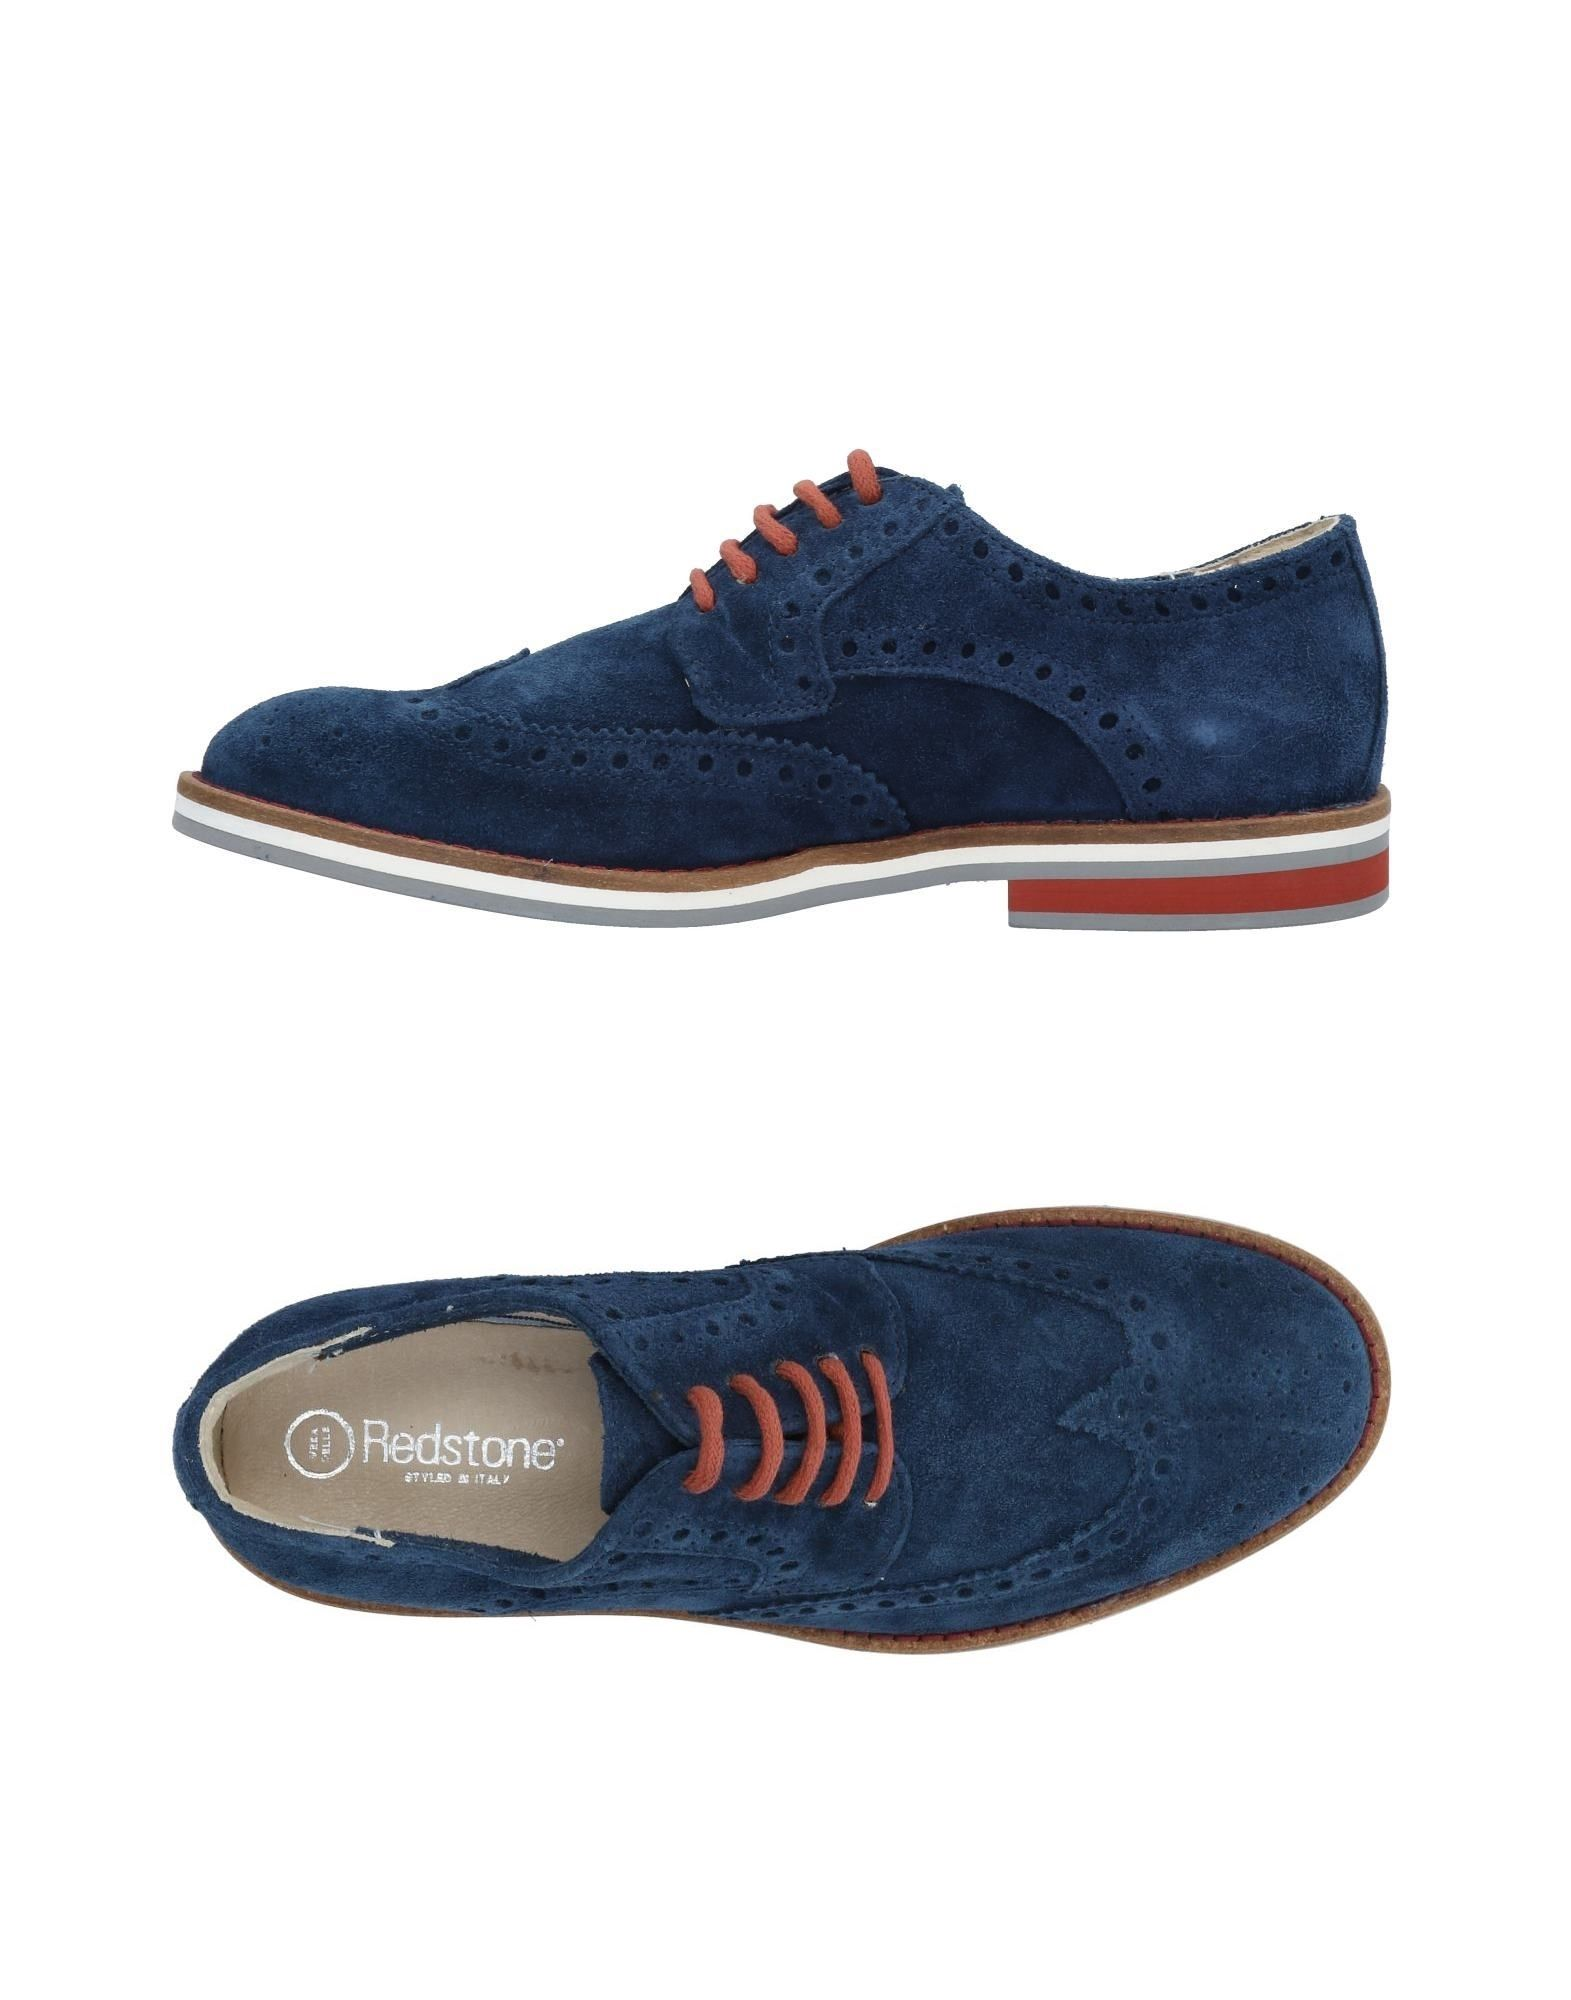 Rabatt echte Schuhe Redstone Schnürschuhe Herren  11488624DQ